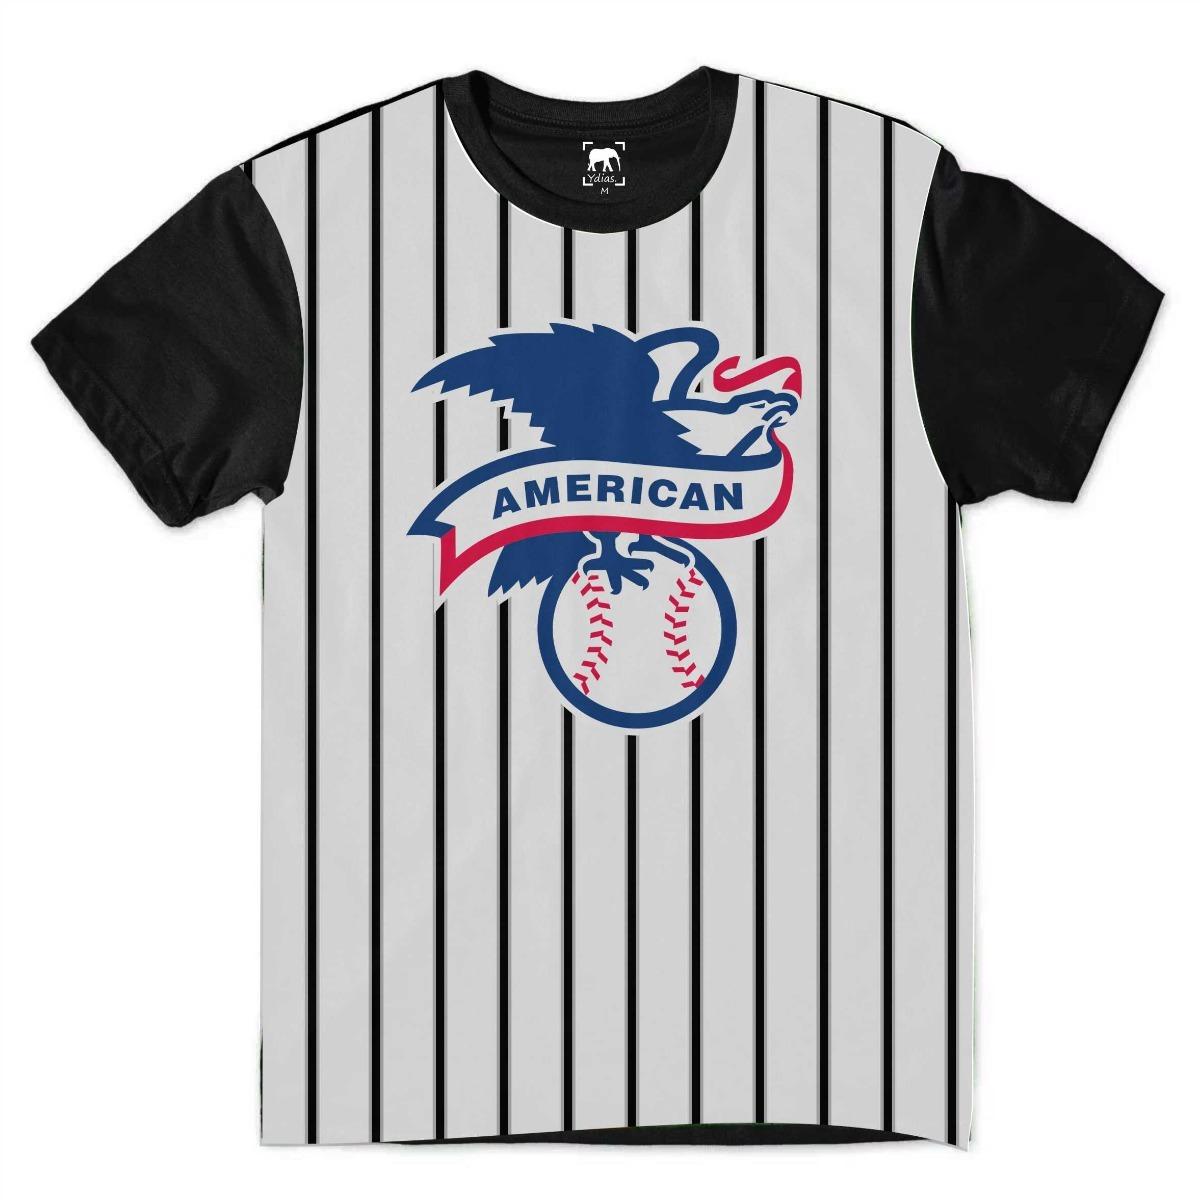 655992f076f74 Camiseta Baseball American League Listrada Bs9 Ydias - R  50